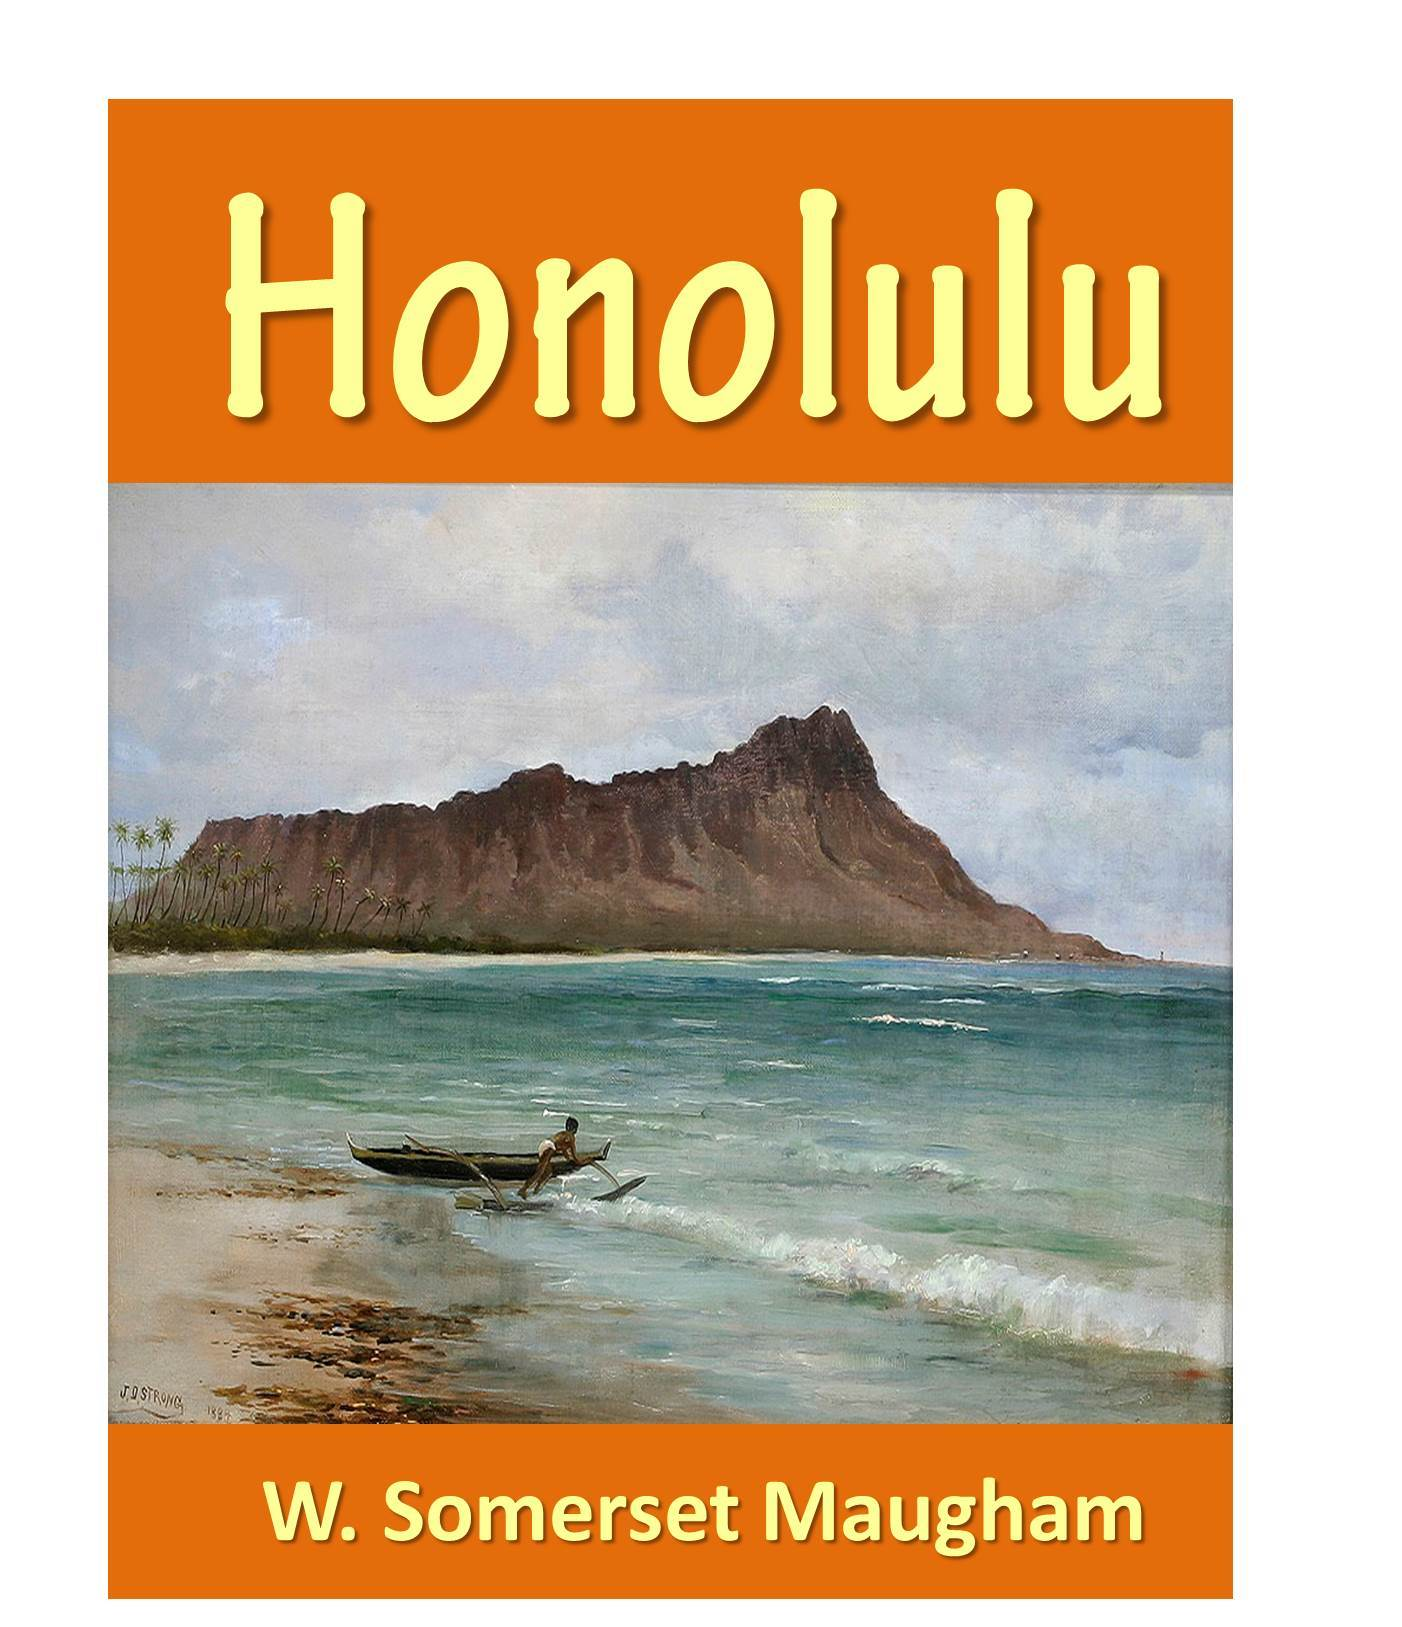 Honolulu W. Somerset Maugham